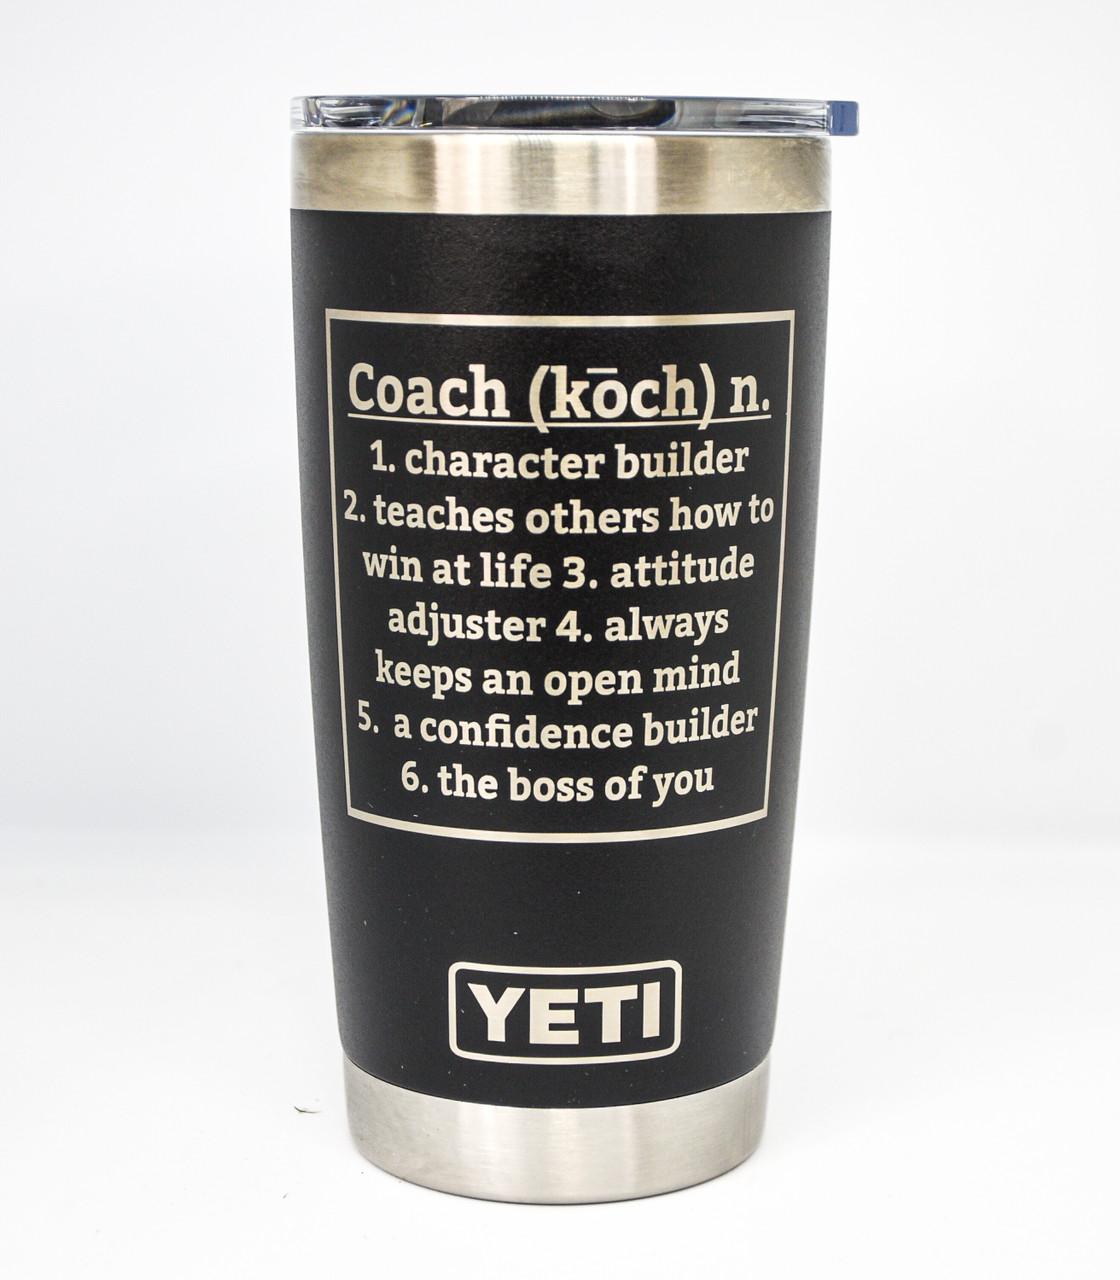 A coach definition engraved on a 20 oz Yeti Rambler